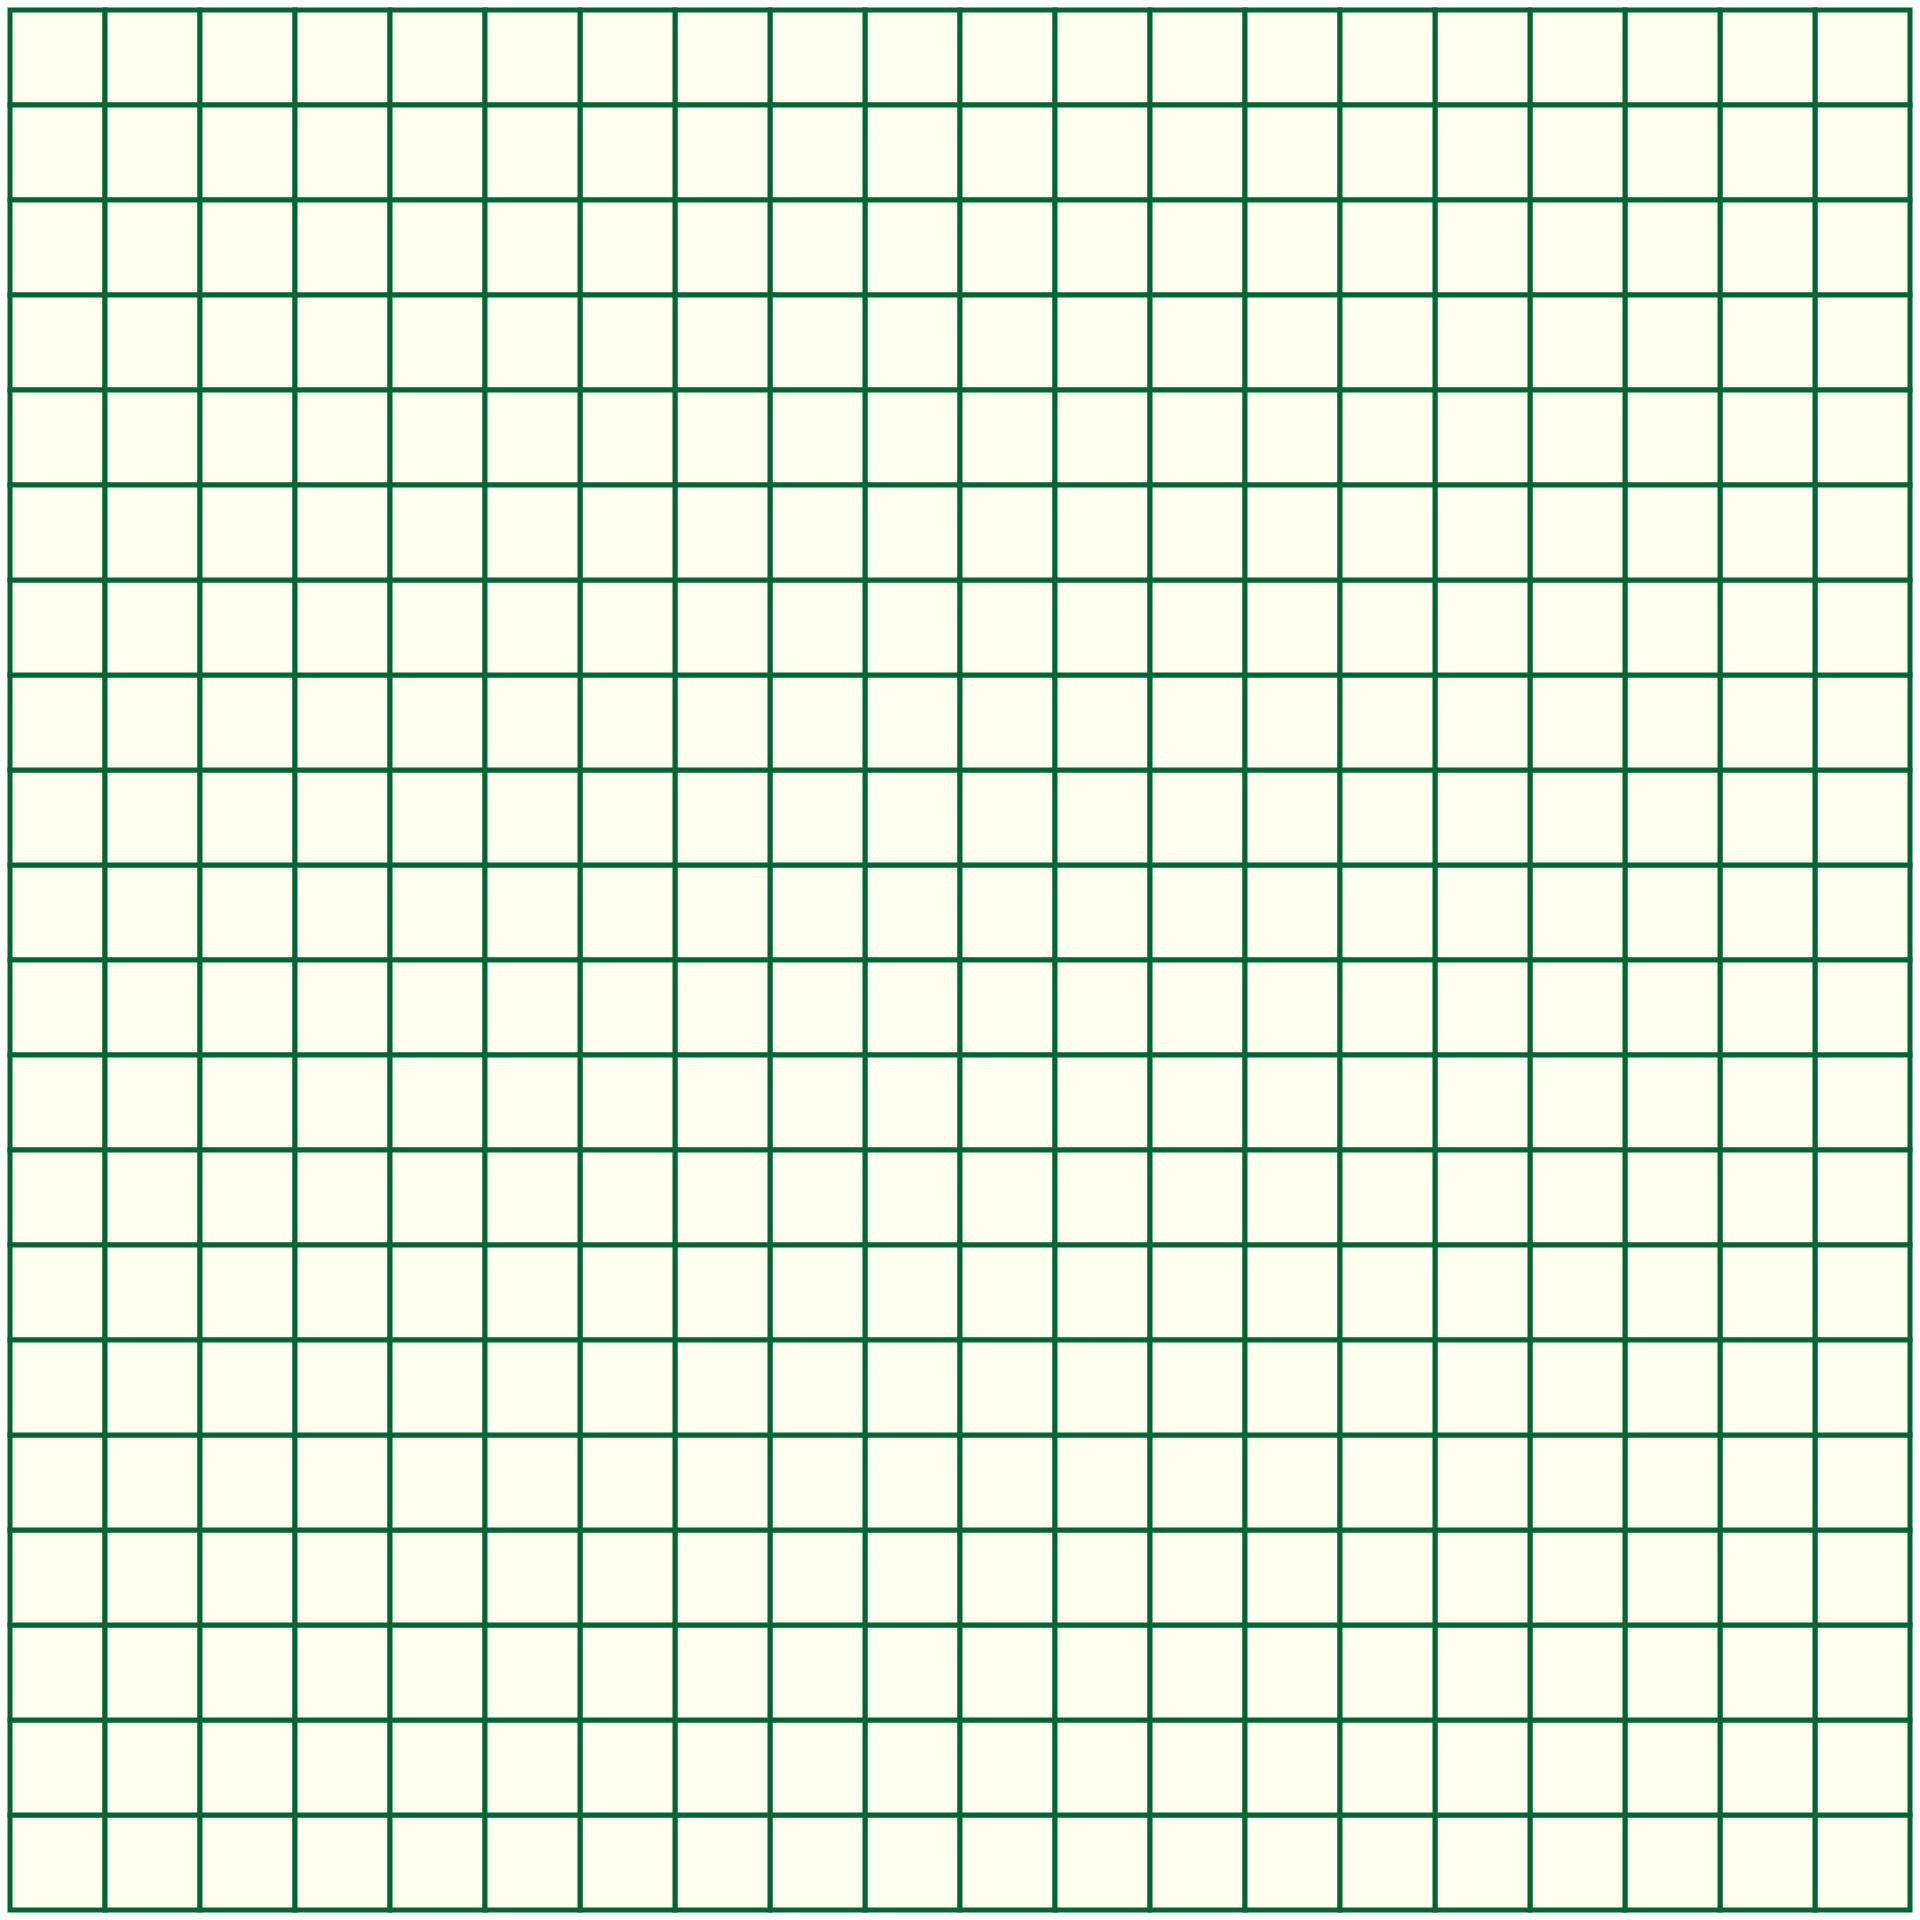 20 X 20 Graph Paper